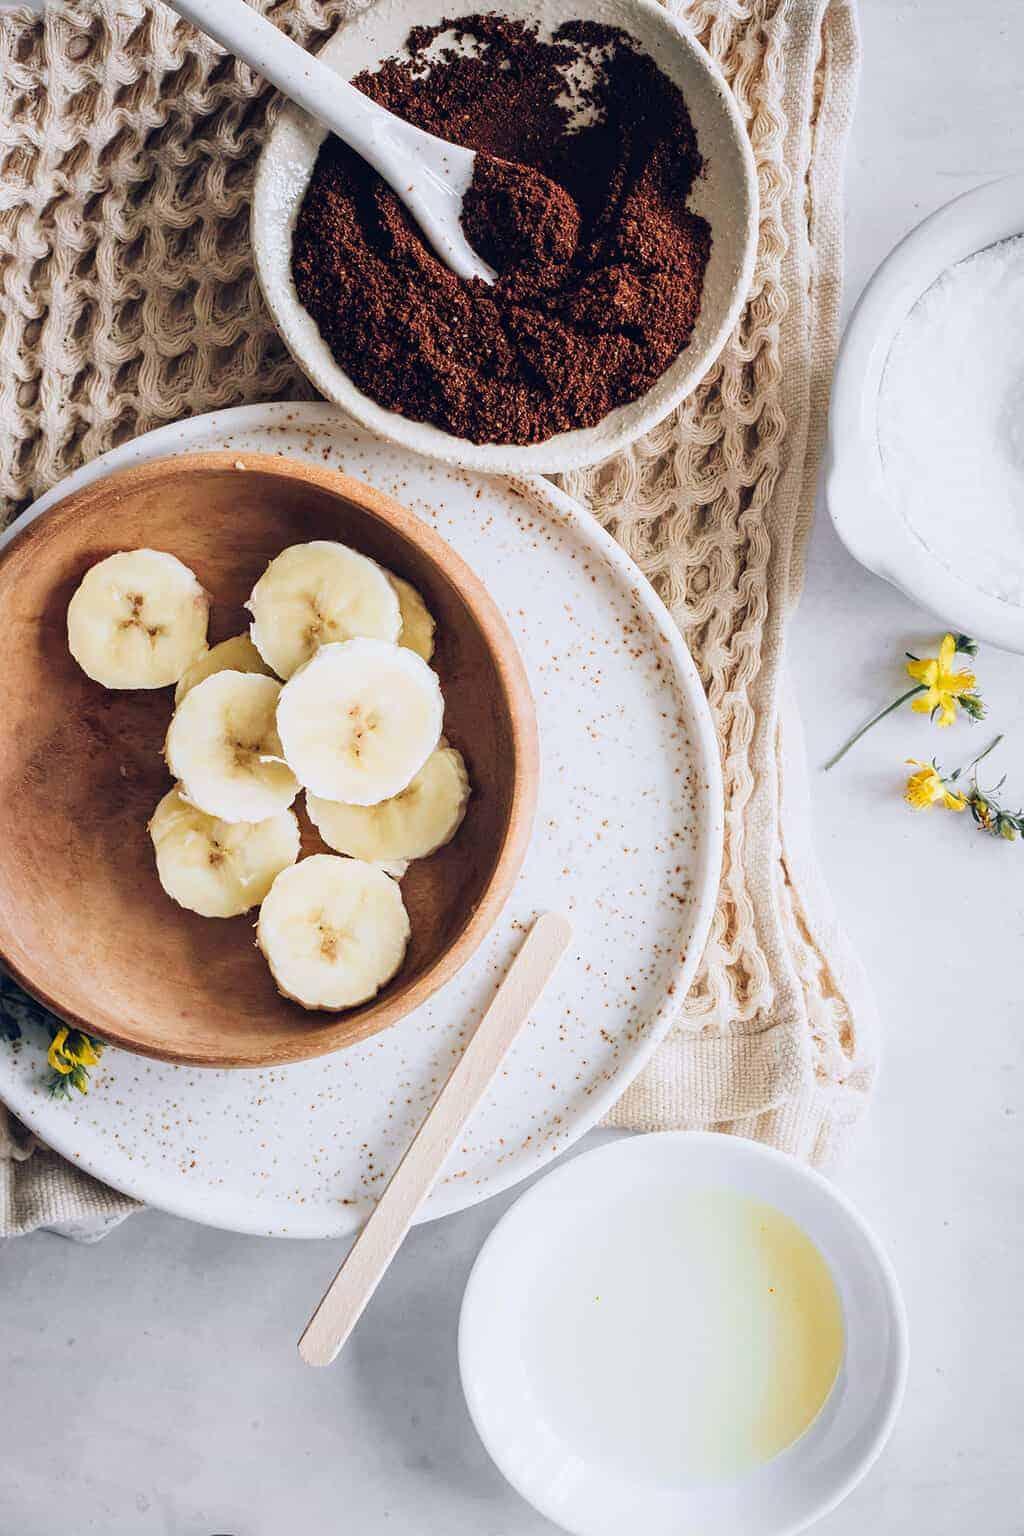 Homemade coffee banana foot scrub